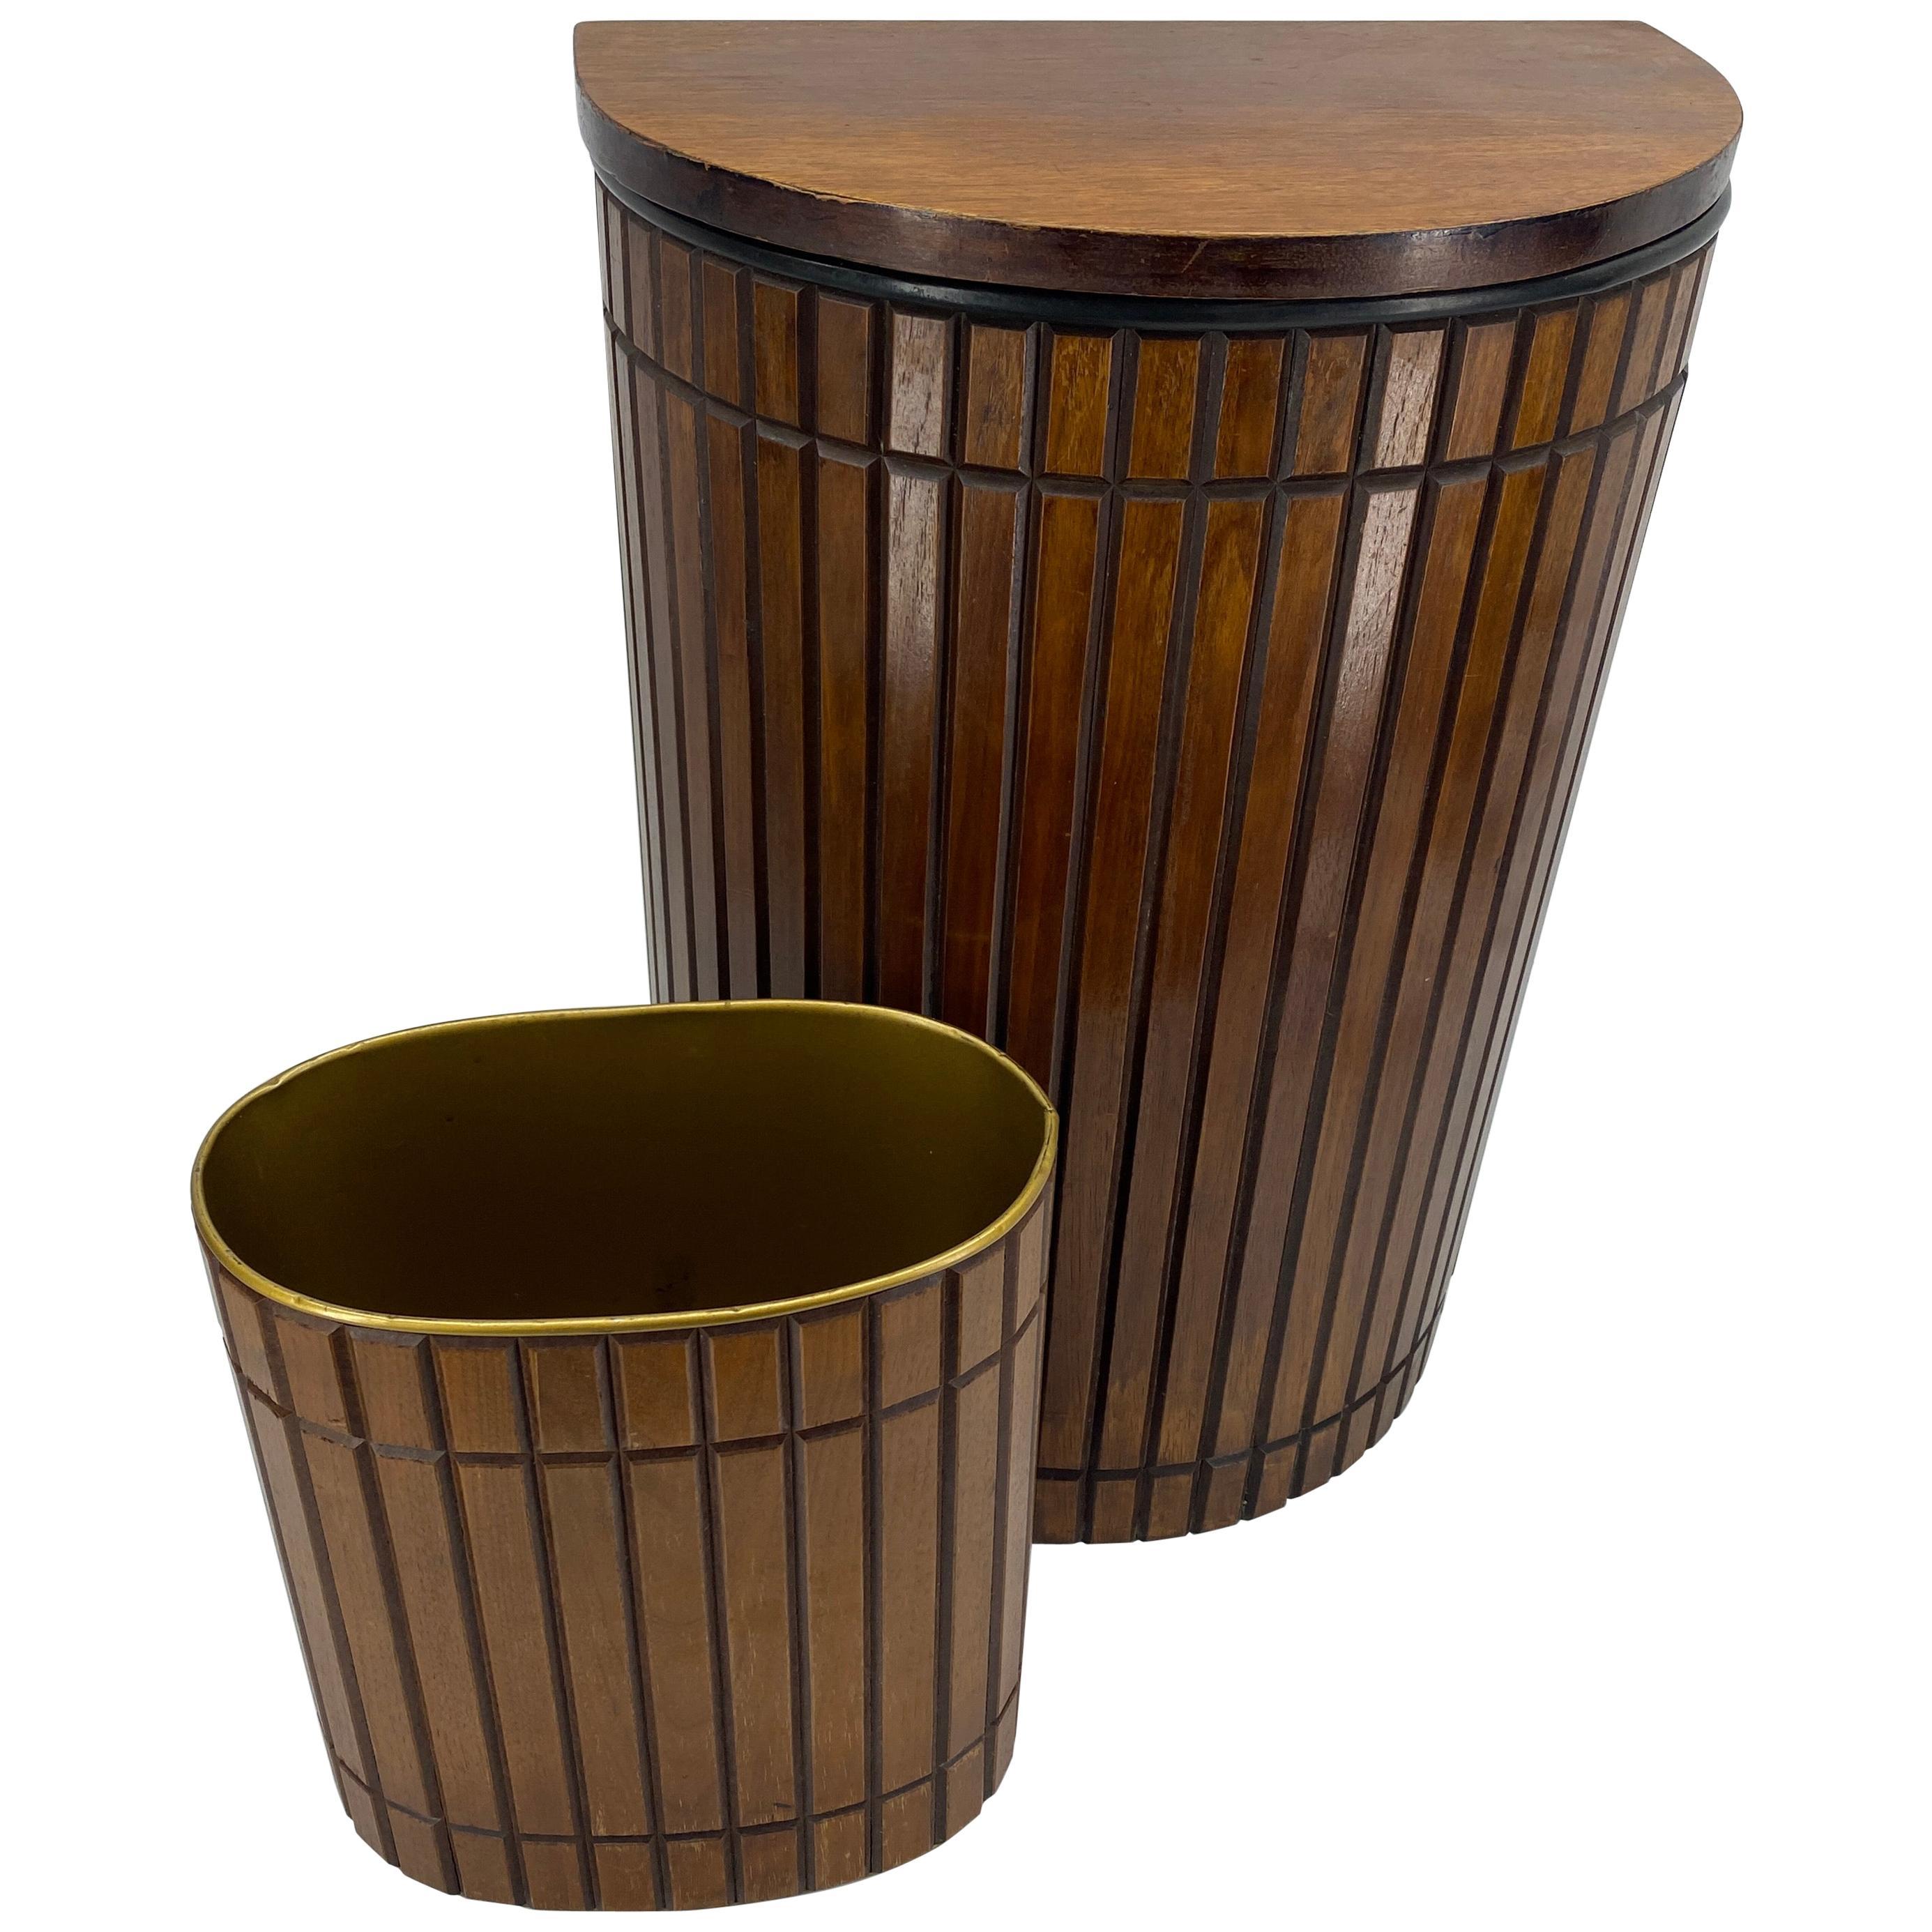 Set of Mid-Century Modern Bathroom Hamper and Wastebasket